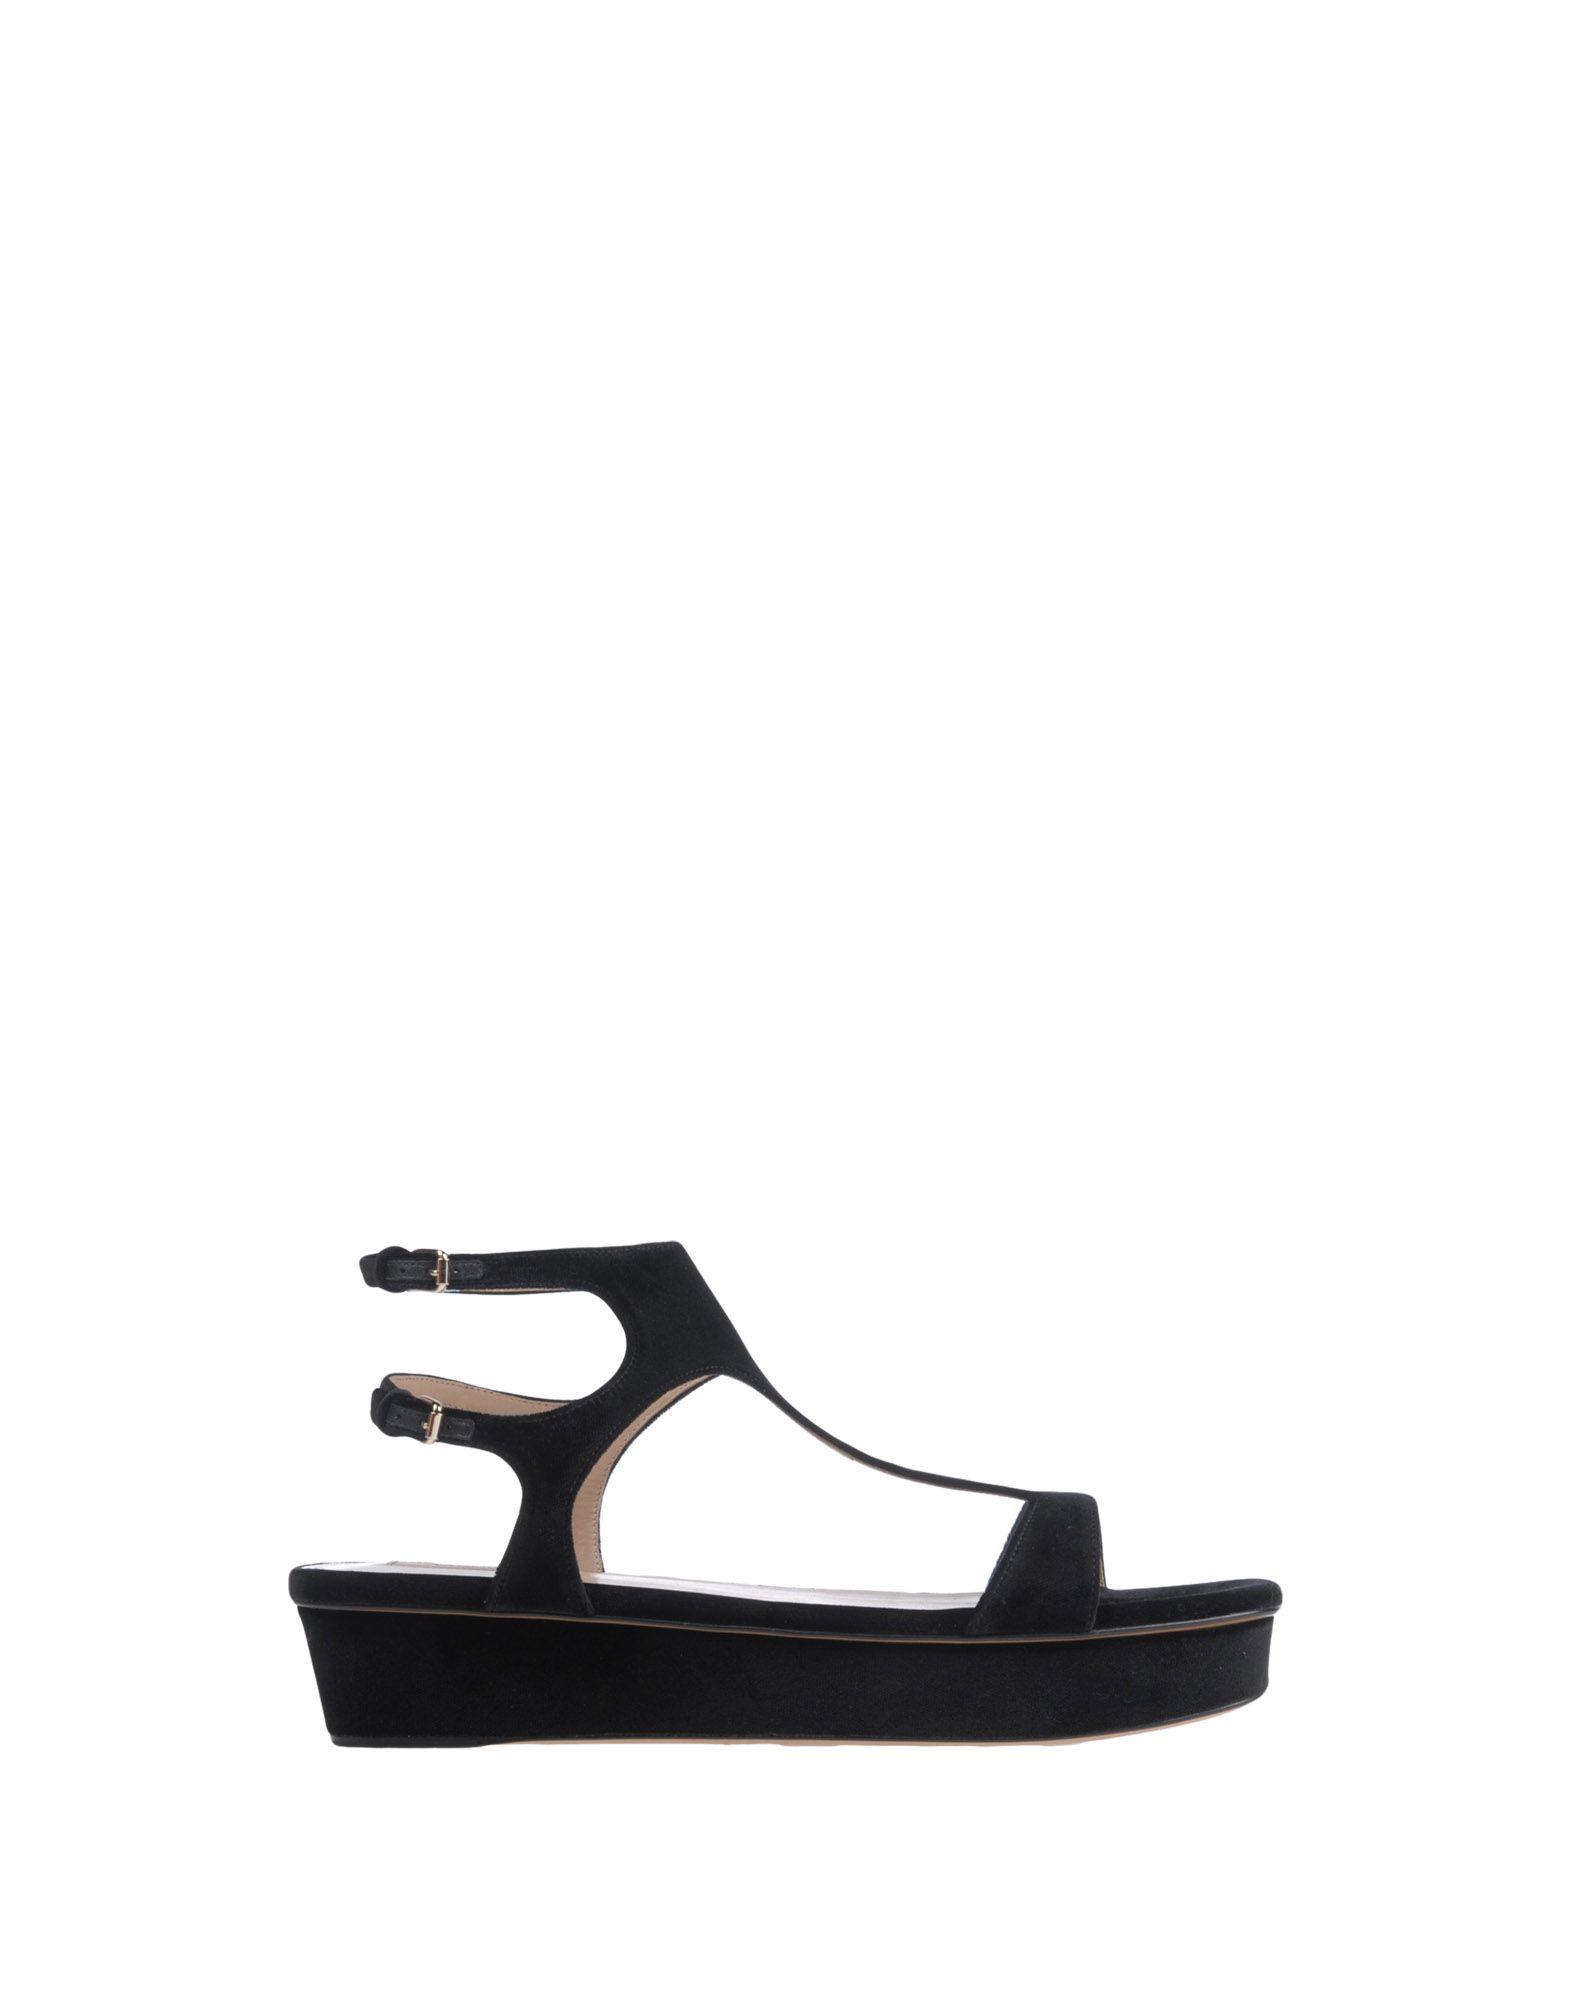 Valentino Garavani Sandalen Damen  Schuhe 11346992EN Beliebte Schuhe  fd4755